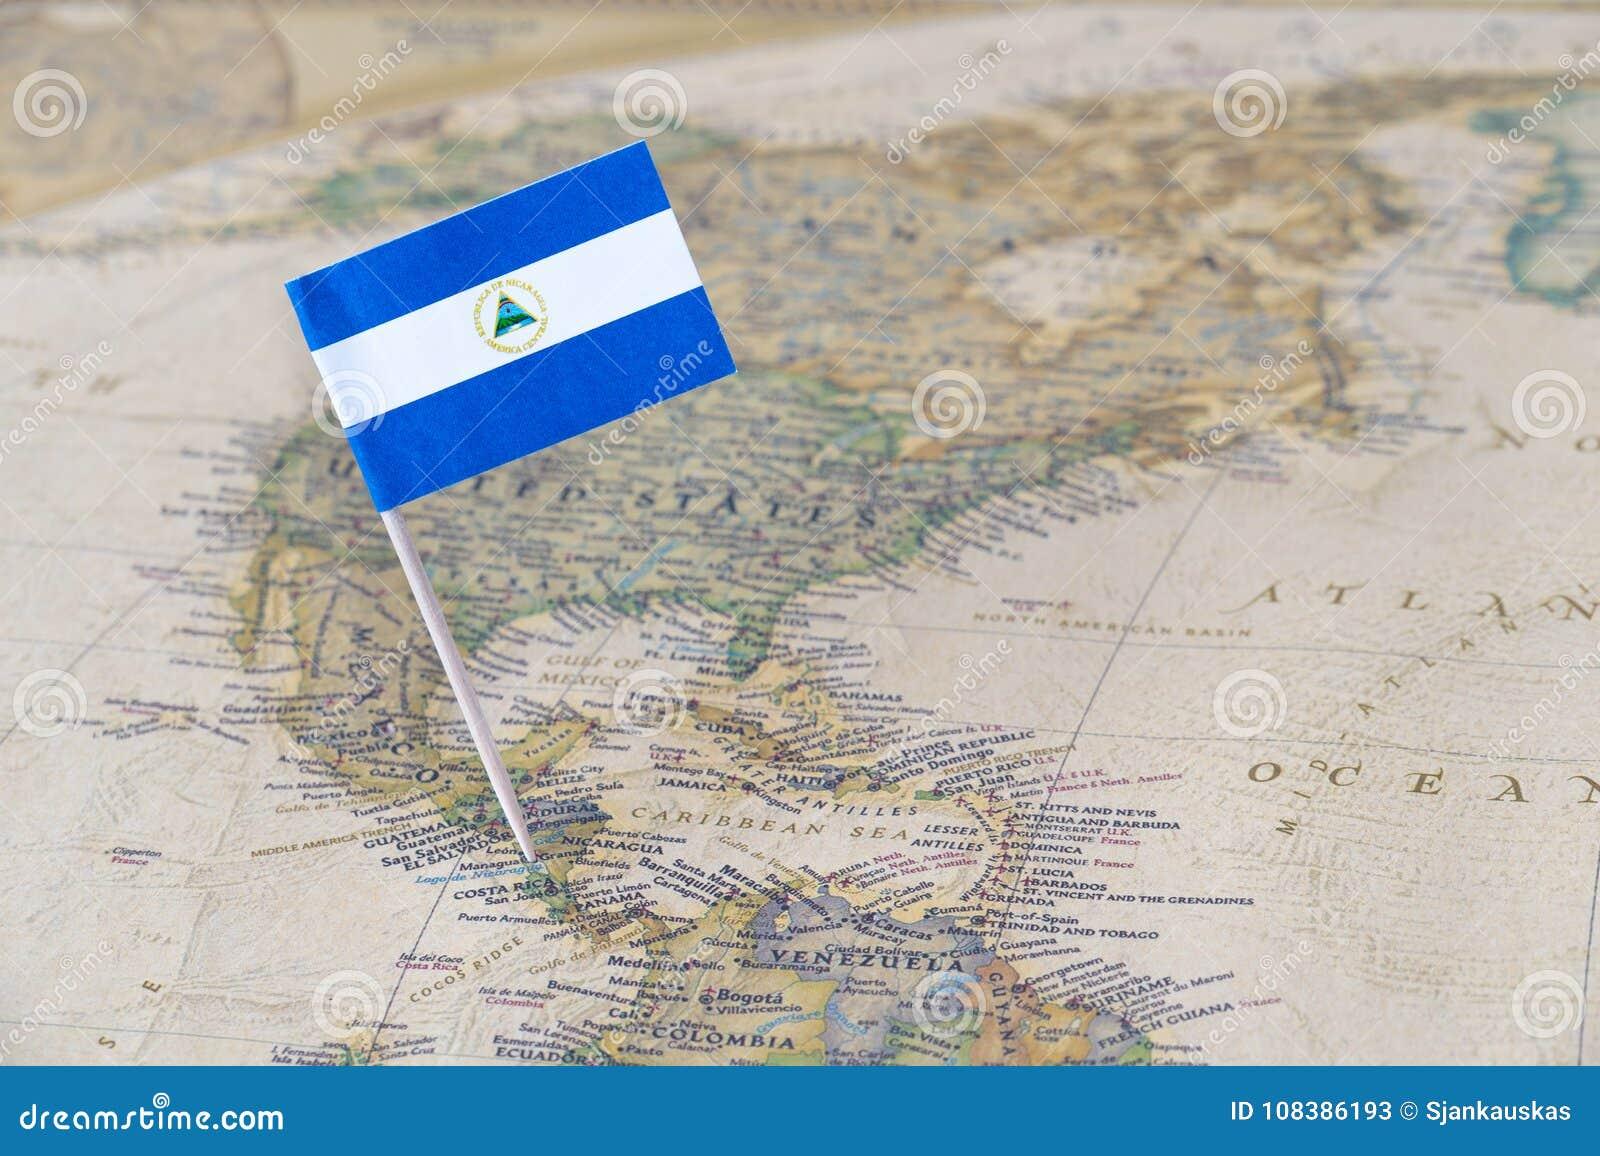 Nicaragua flag pin on world map stock image image of countries nicaragua flag pin on world map royalty free stock photo gumiabroncs Images